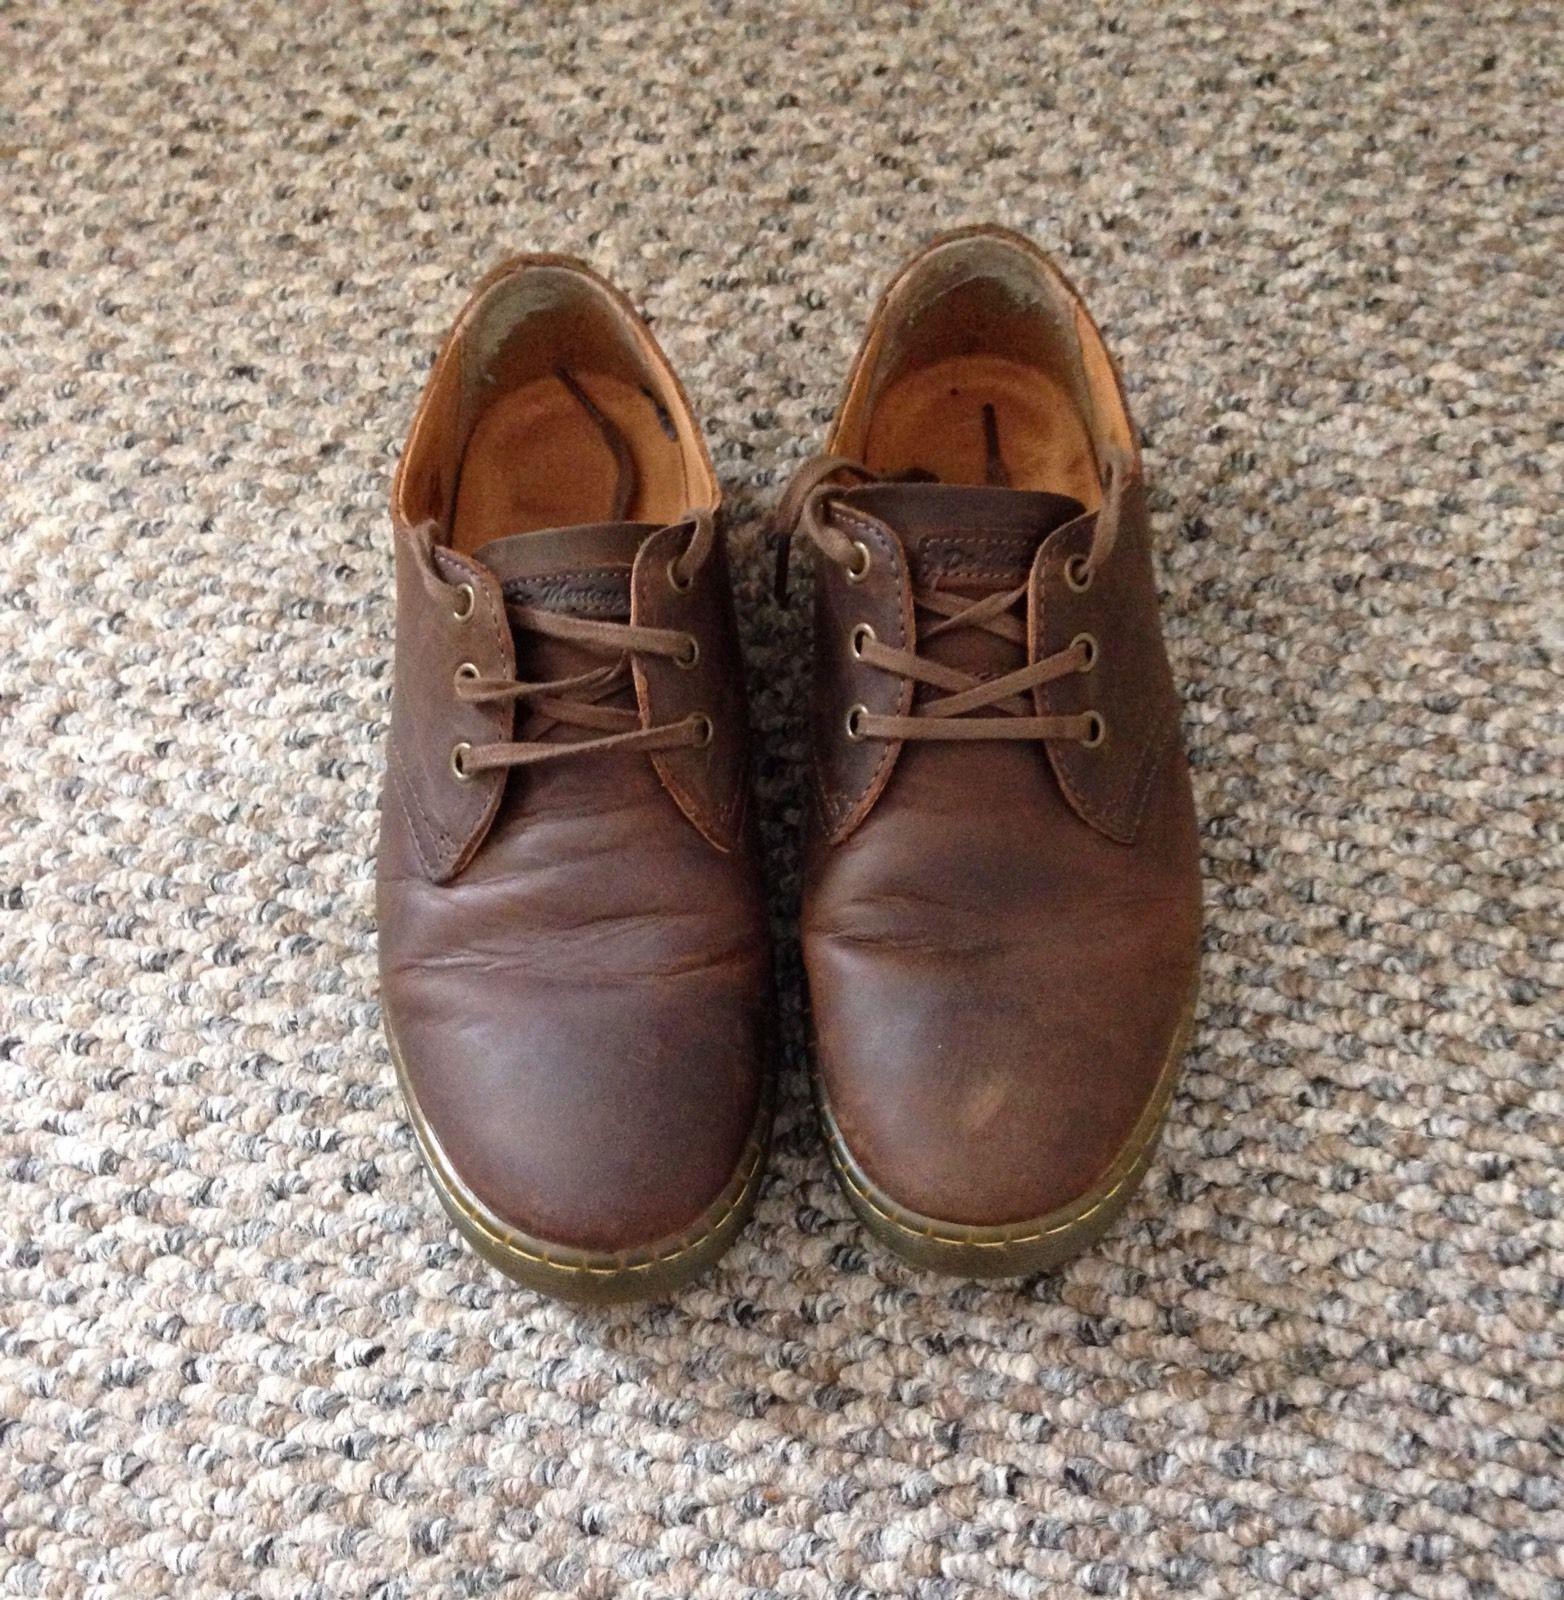 e92dce73b8bee Dr Marten Coronado in Clothes, Shoes & Accessories, Men's Shoes ...